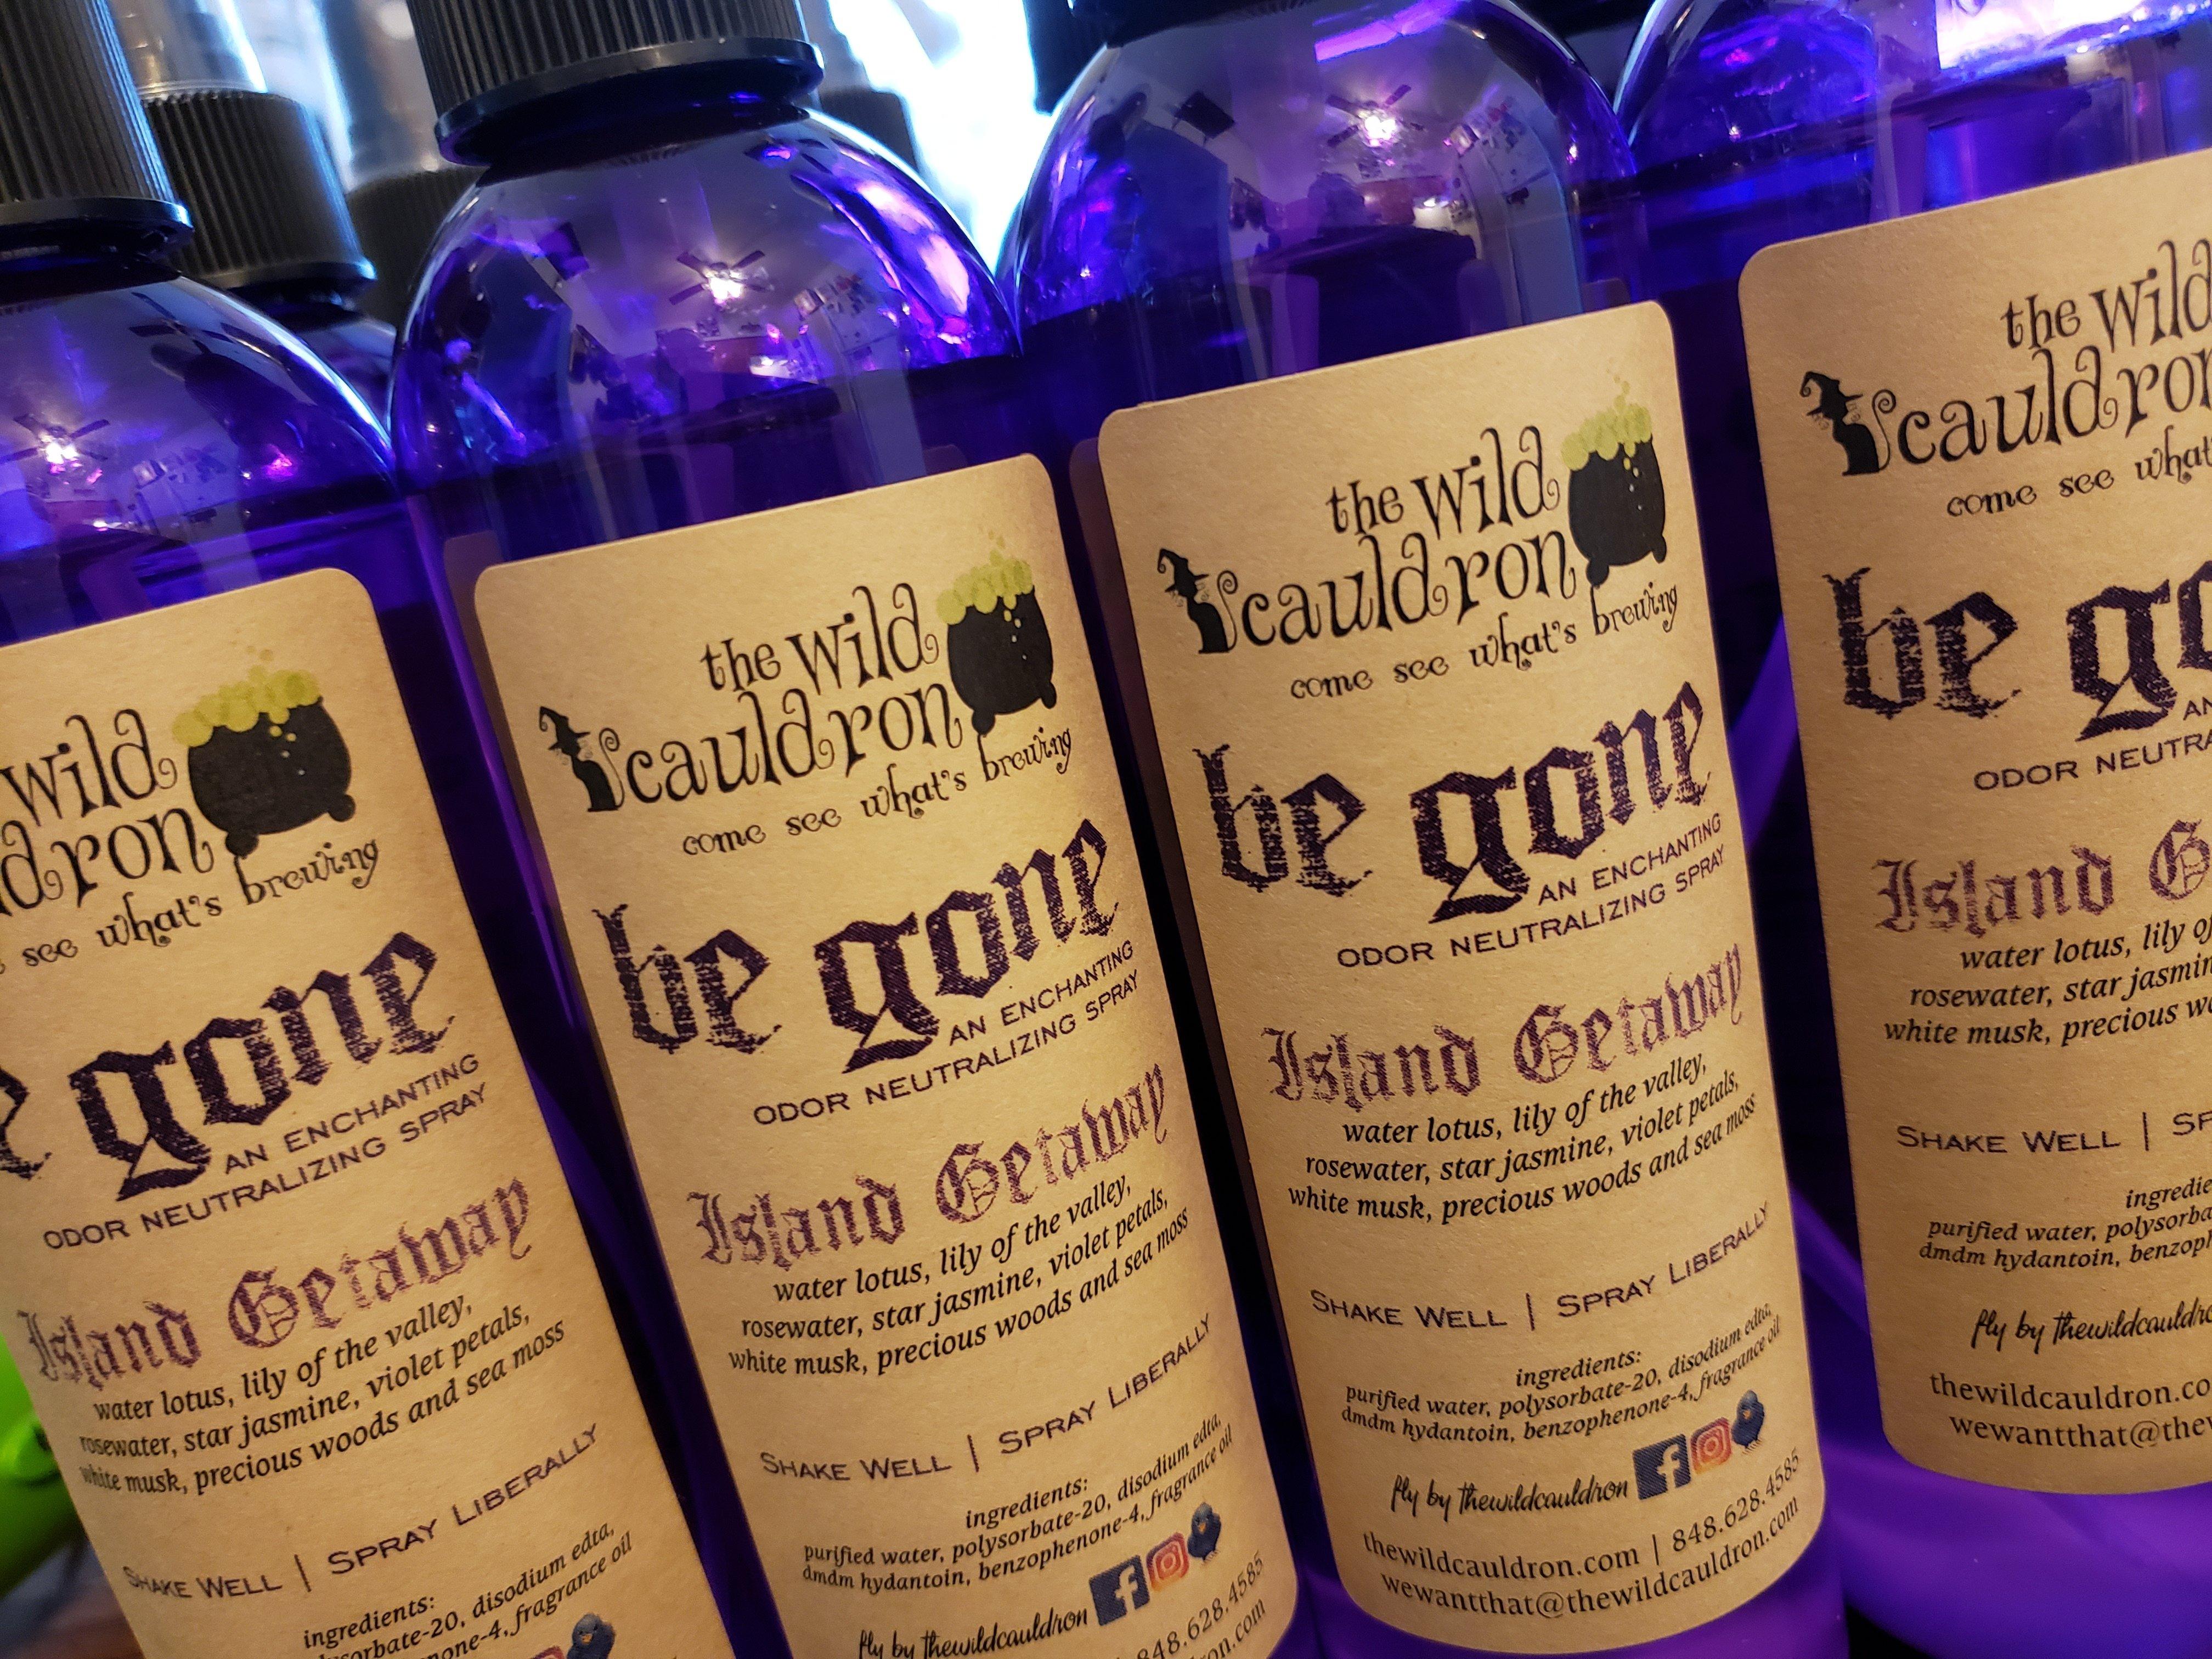 The Beachcomber - Be Gone Odor Neutralizing Spray BGS05